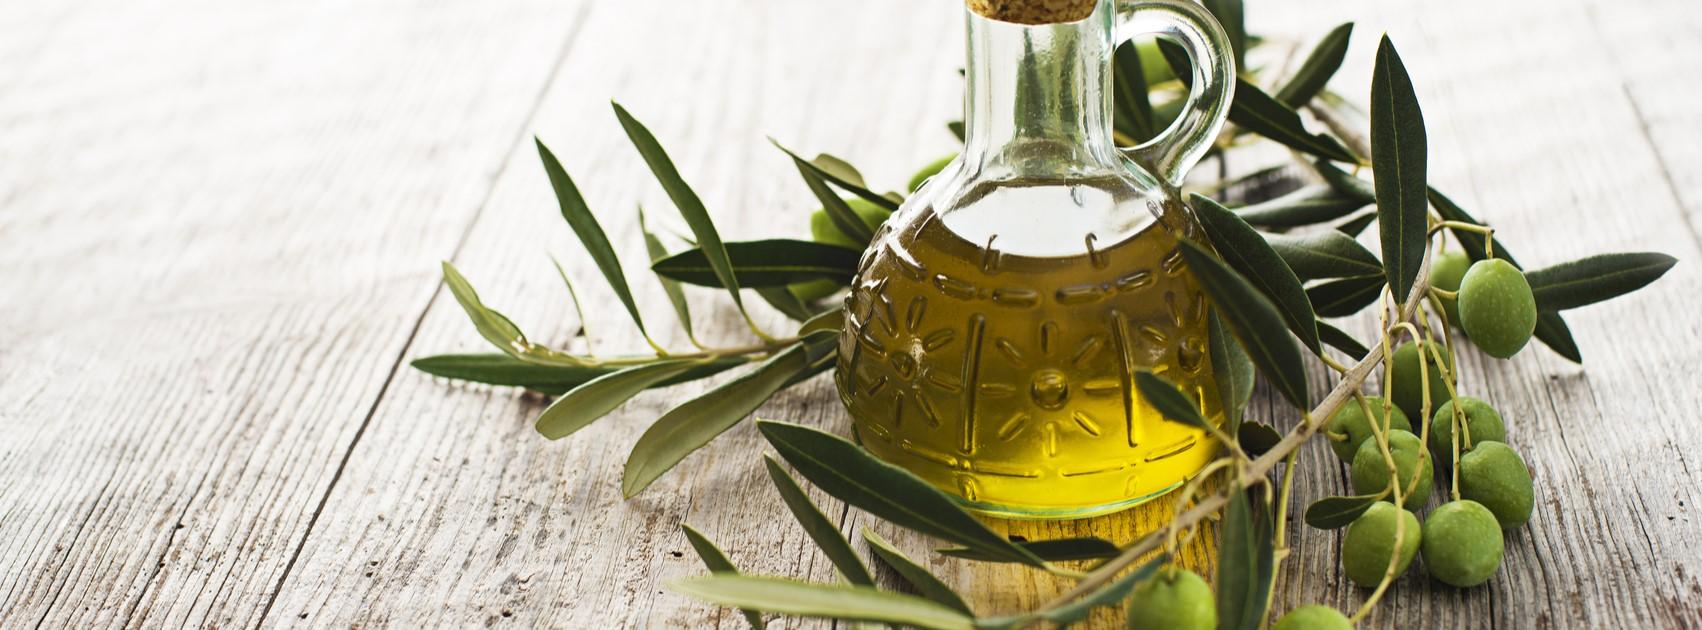 olive-oil-long-version.jpg